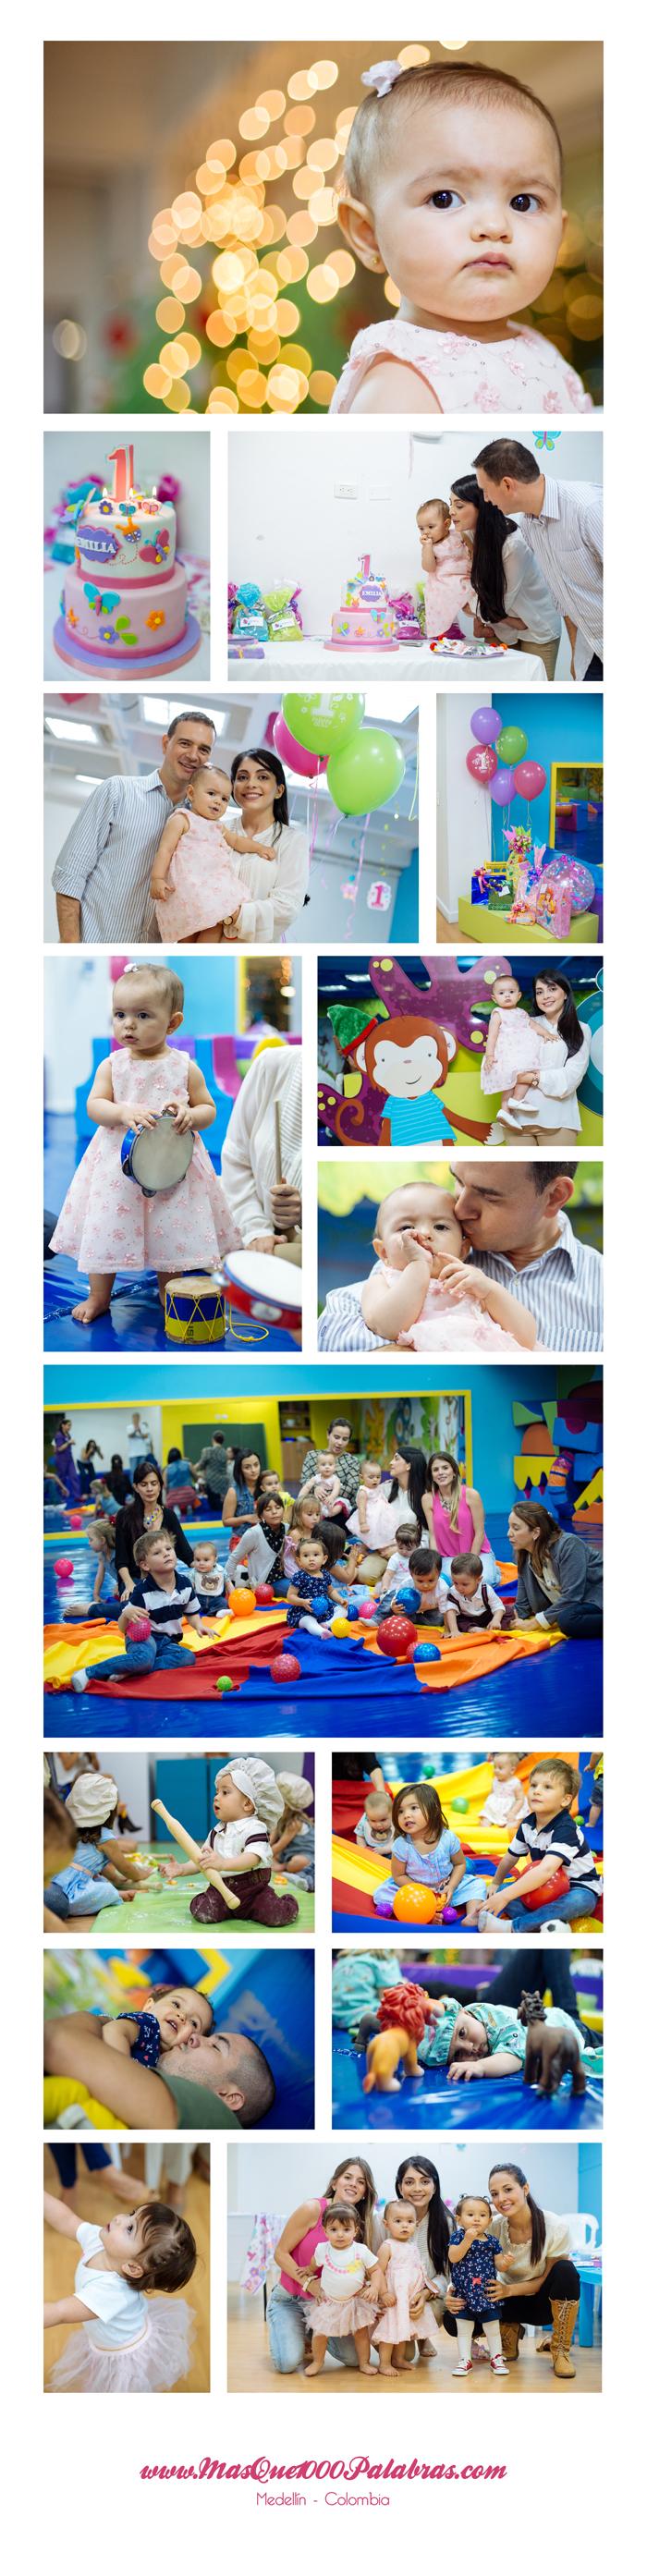 fotografia, fotos, dinamikos, medellin, masque1000palabras, mas que mil palabras, fotos, bebés